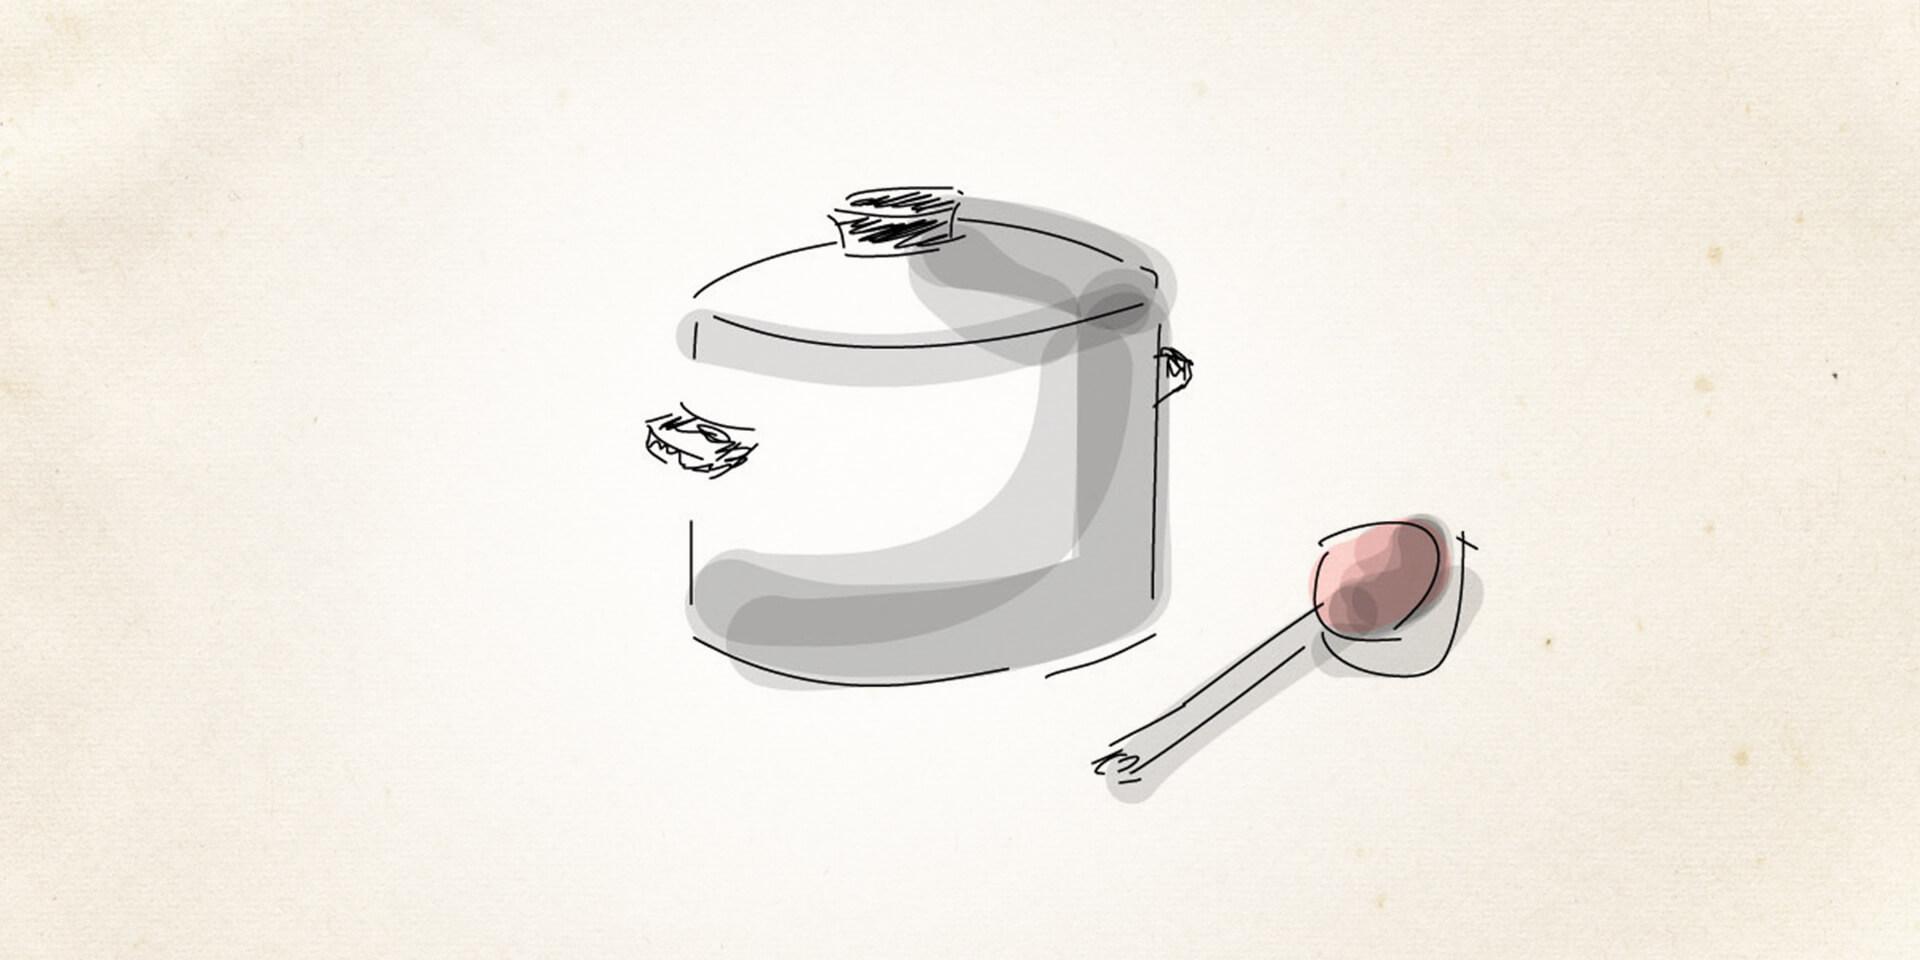 Kochtopf und Löffel